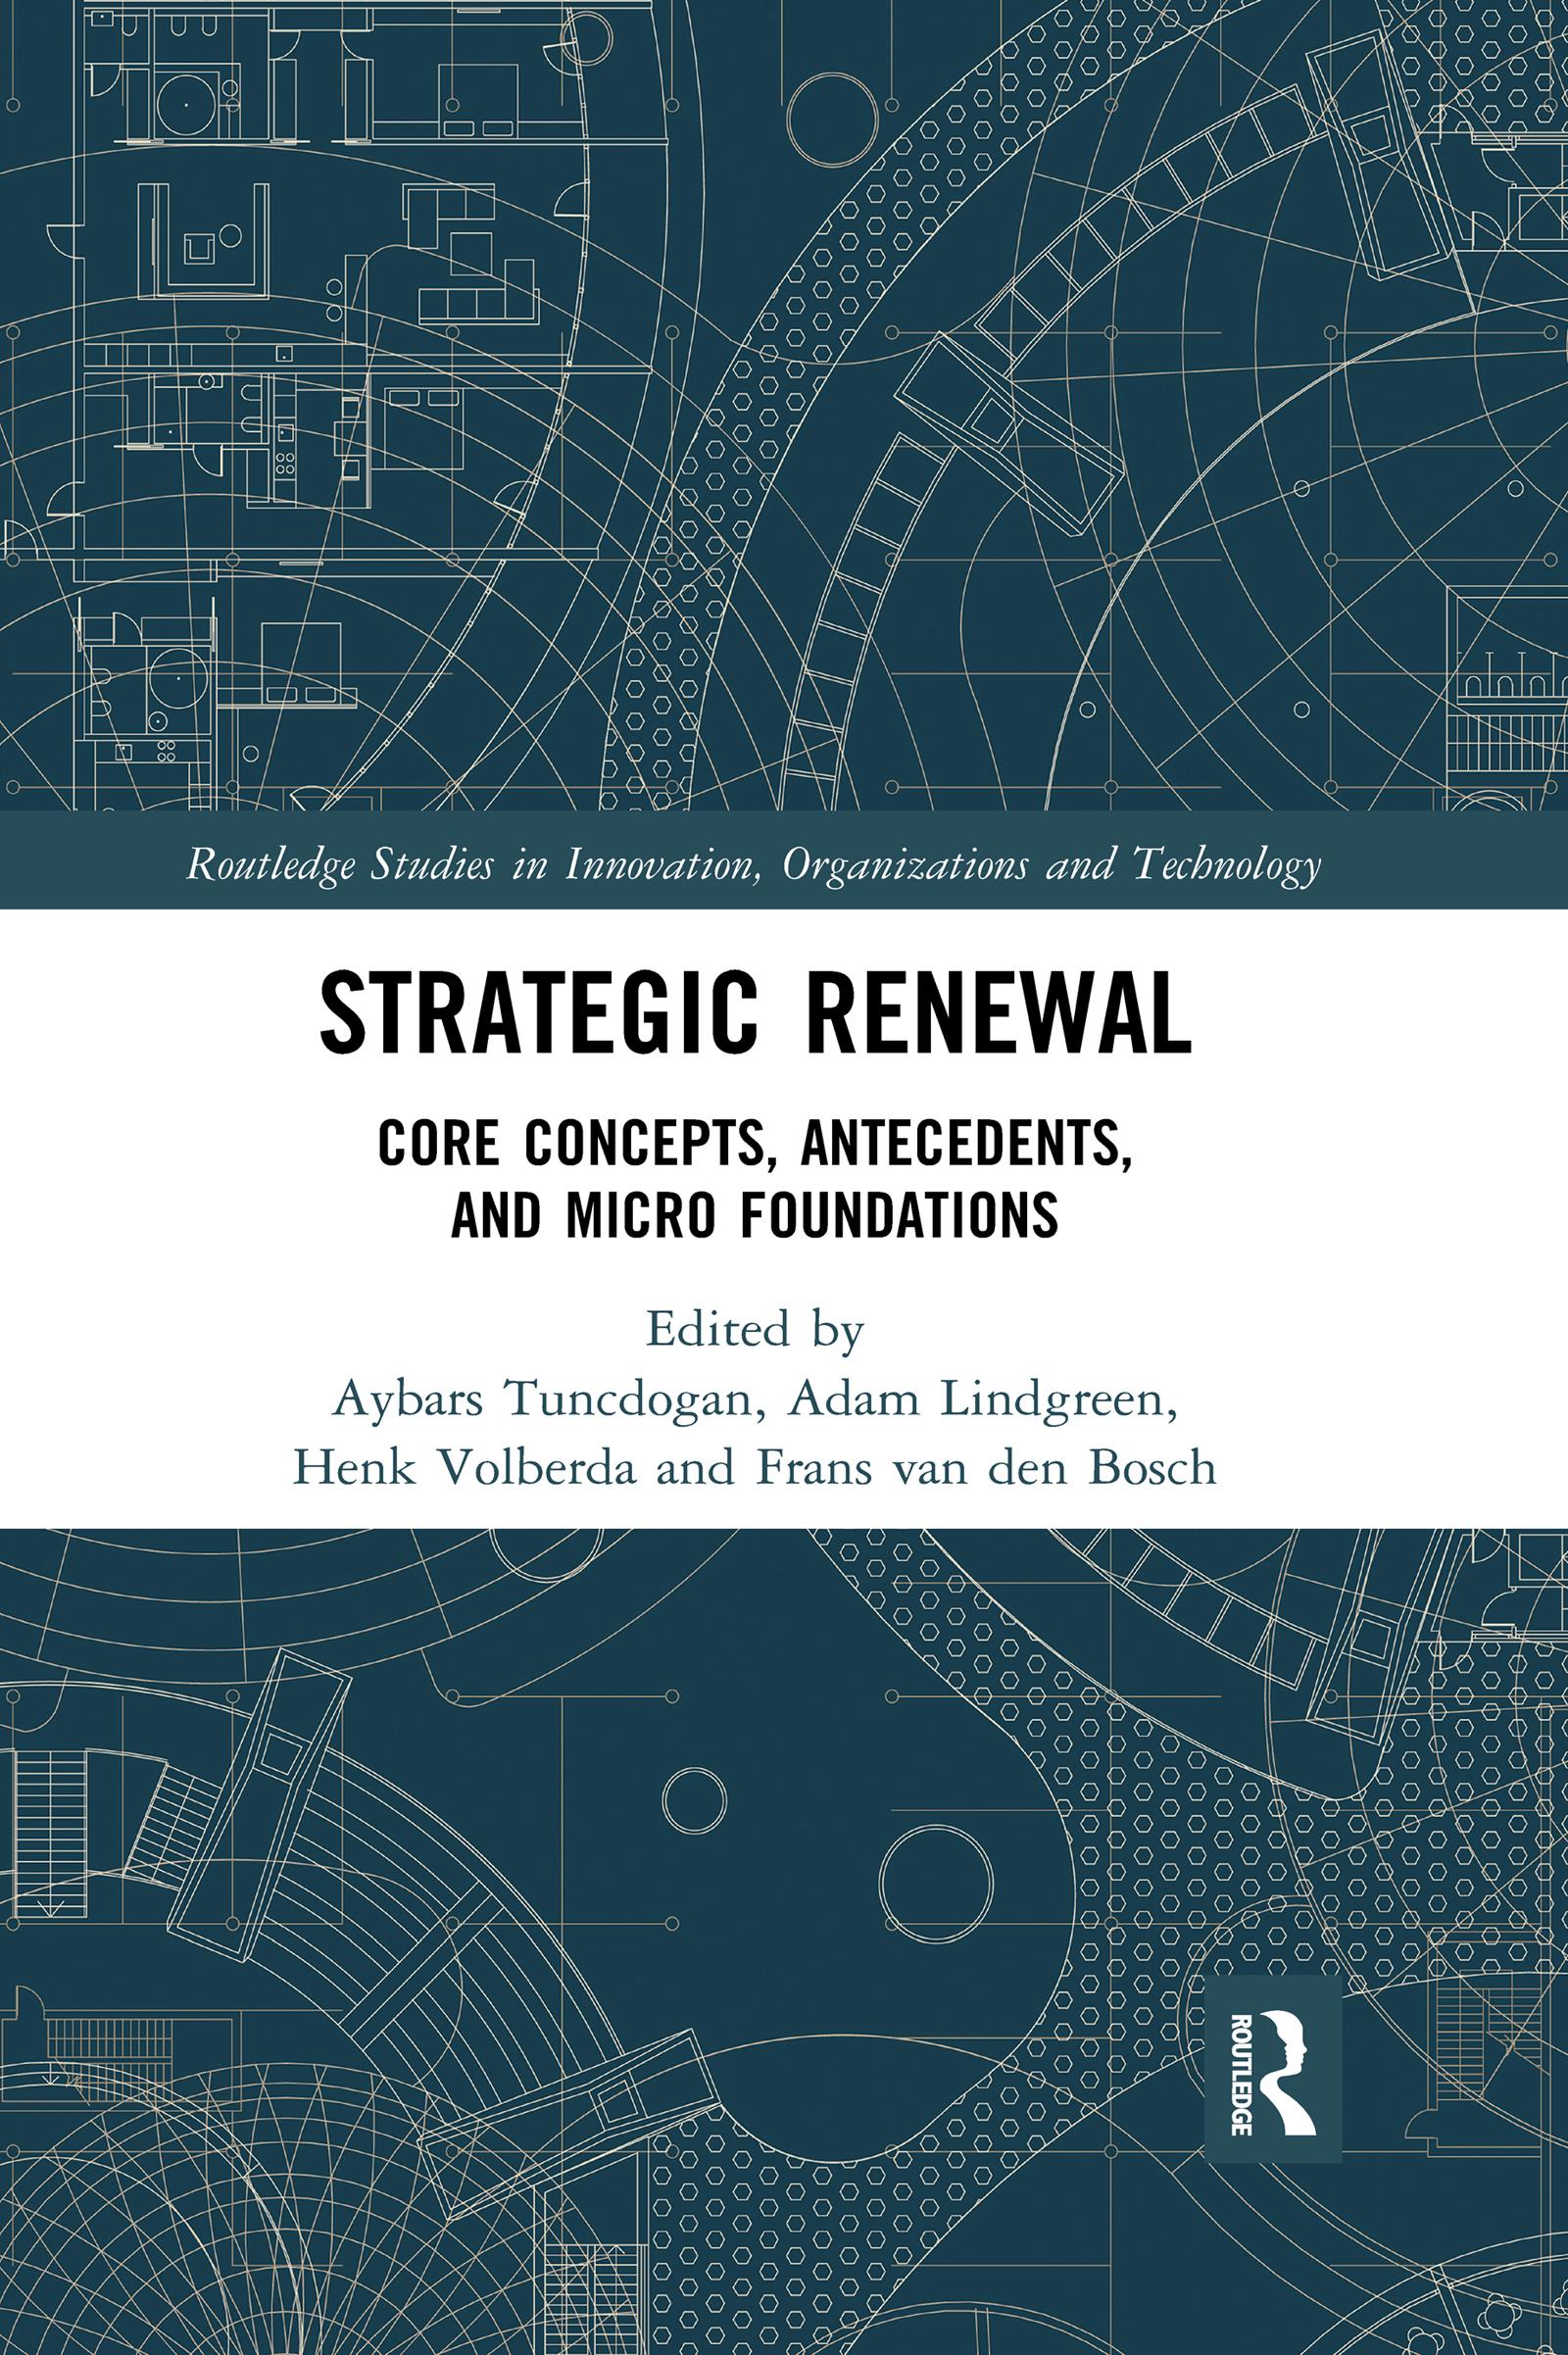 Strategic renewal and dynamic capabilities